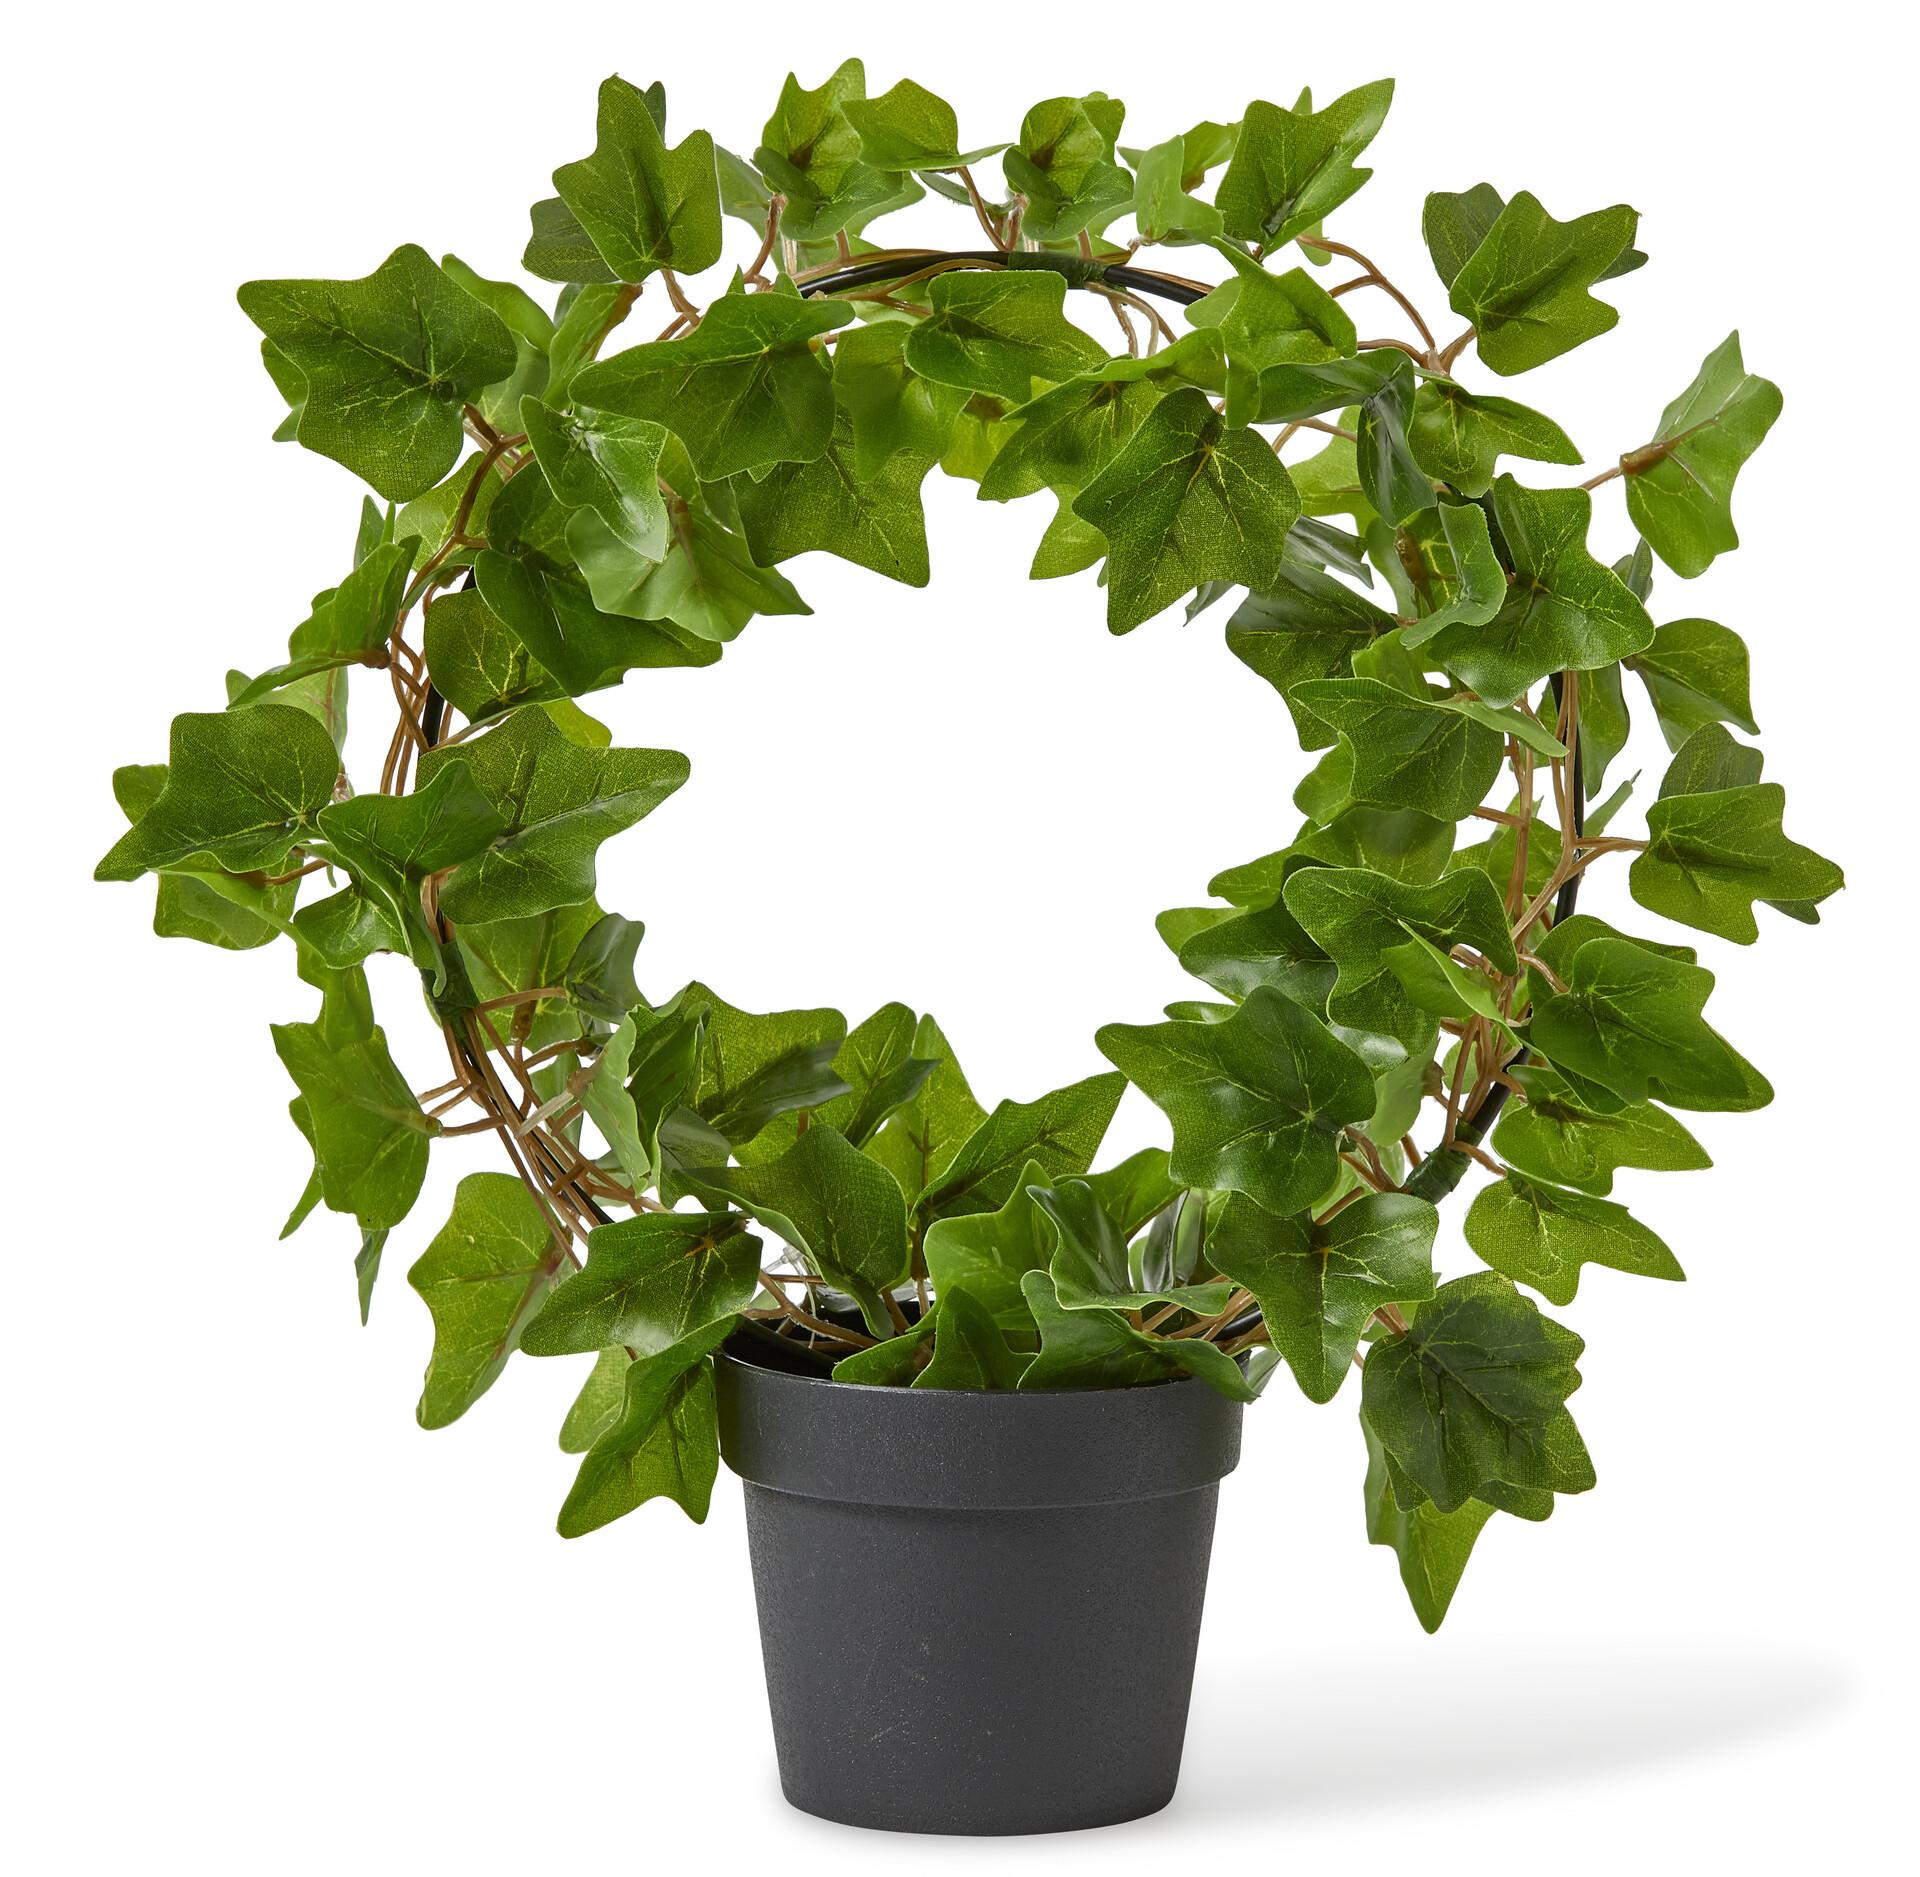 konstgjorda växter murgröna